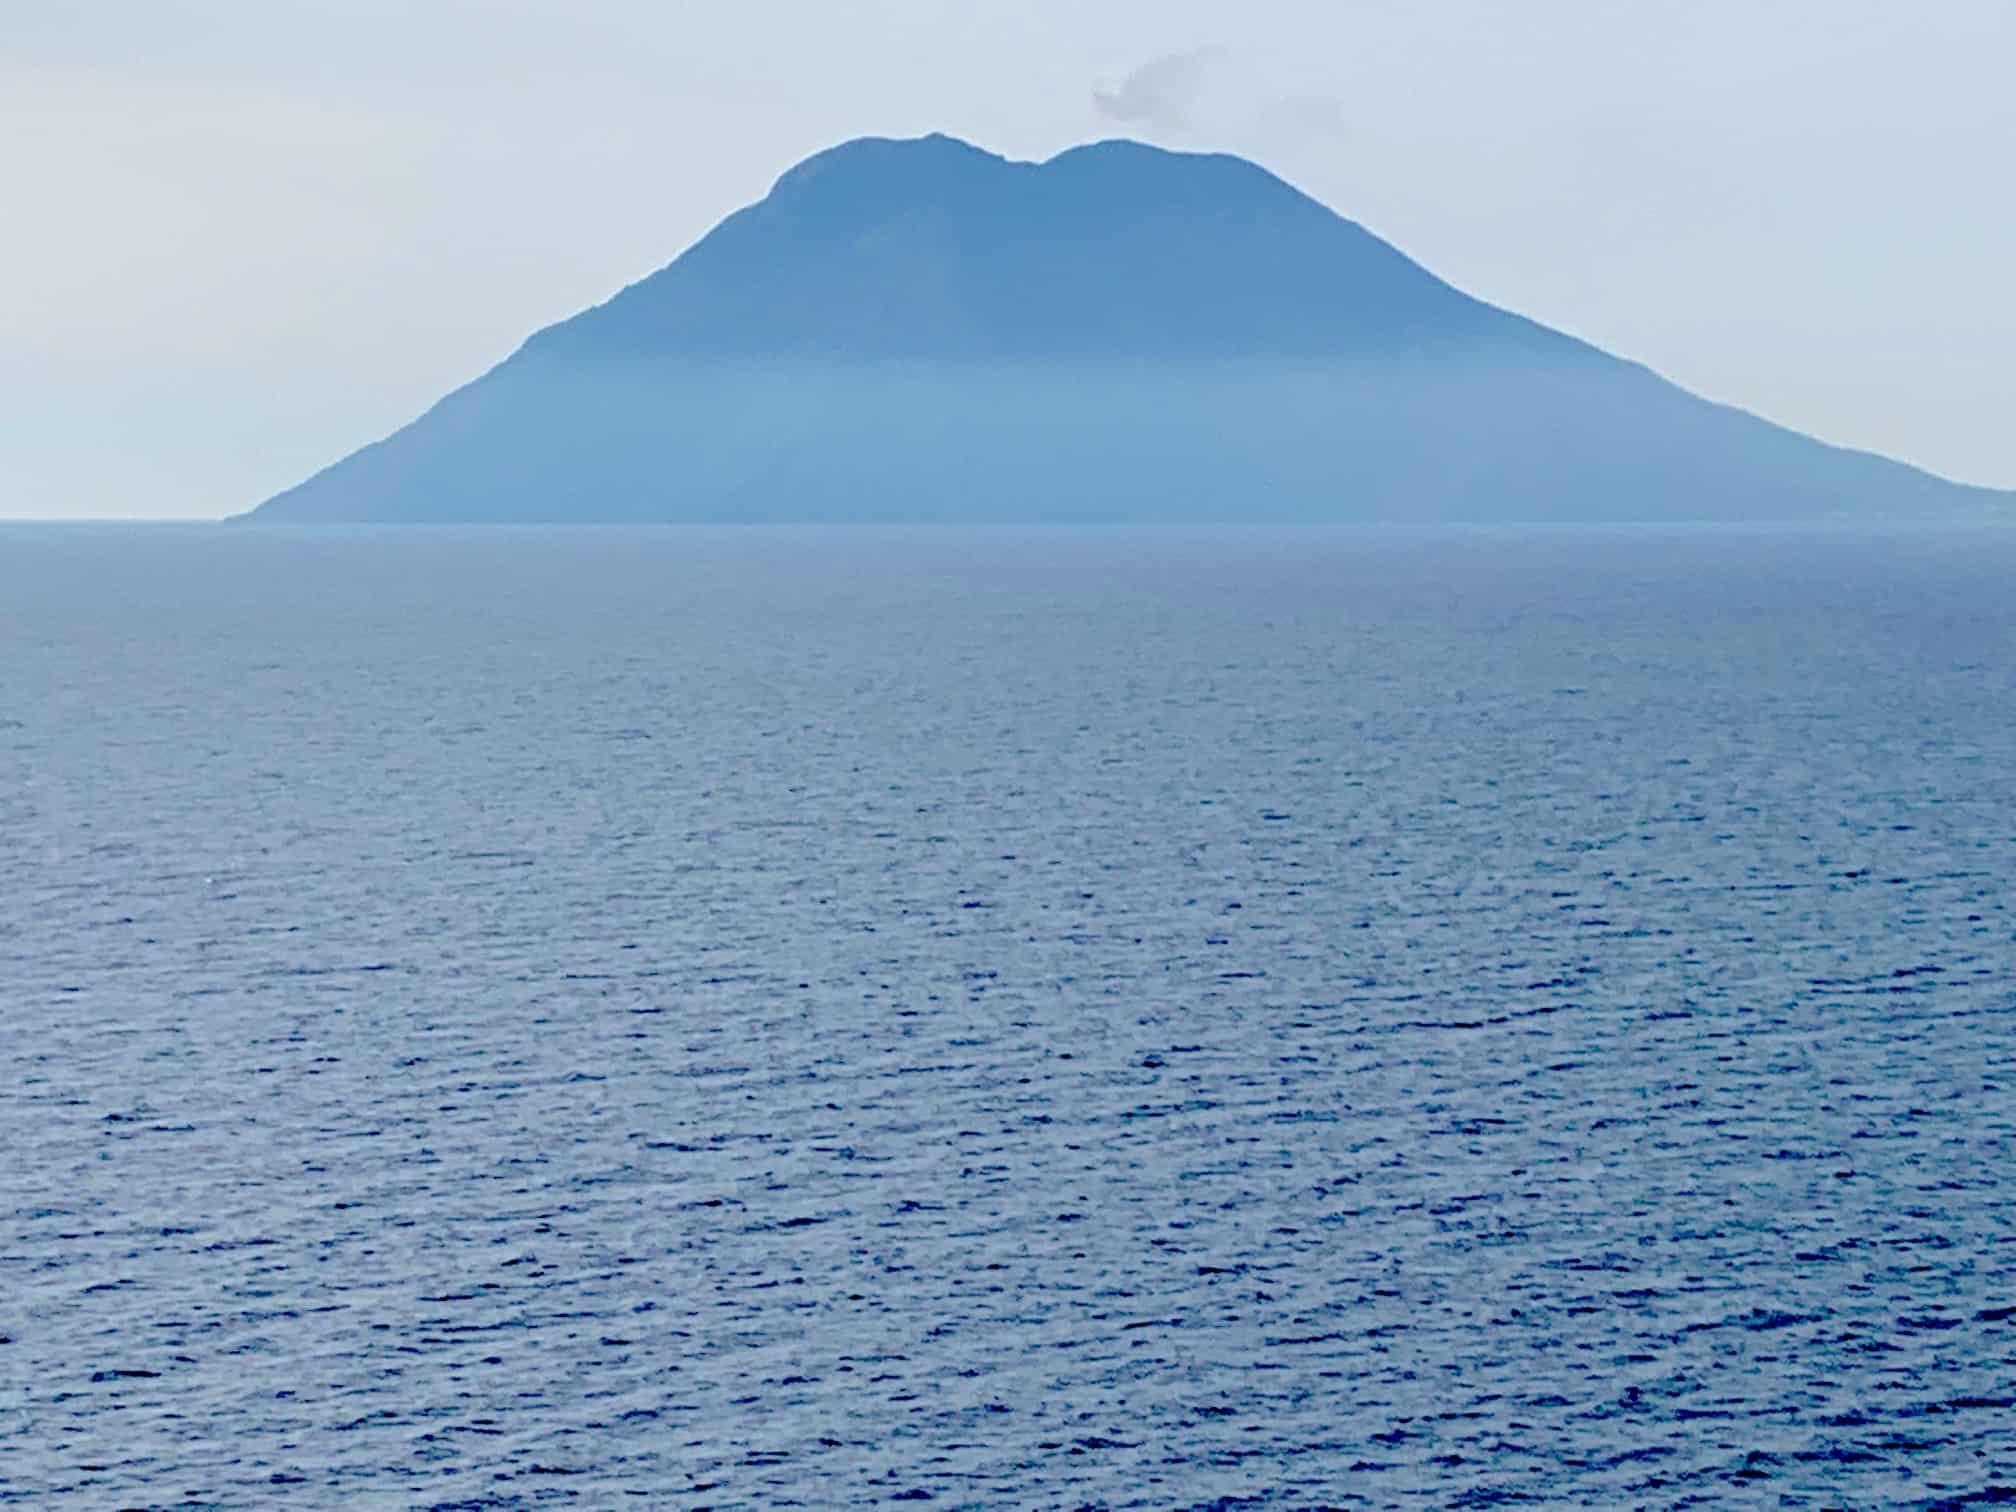 The volcano on Stromboli